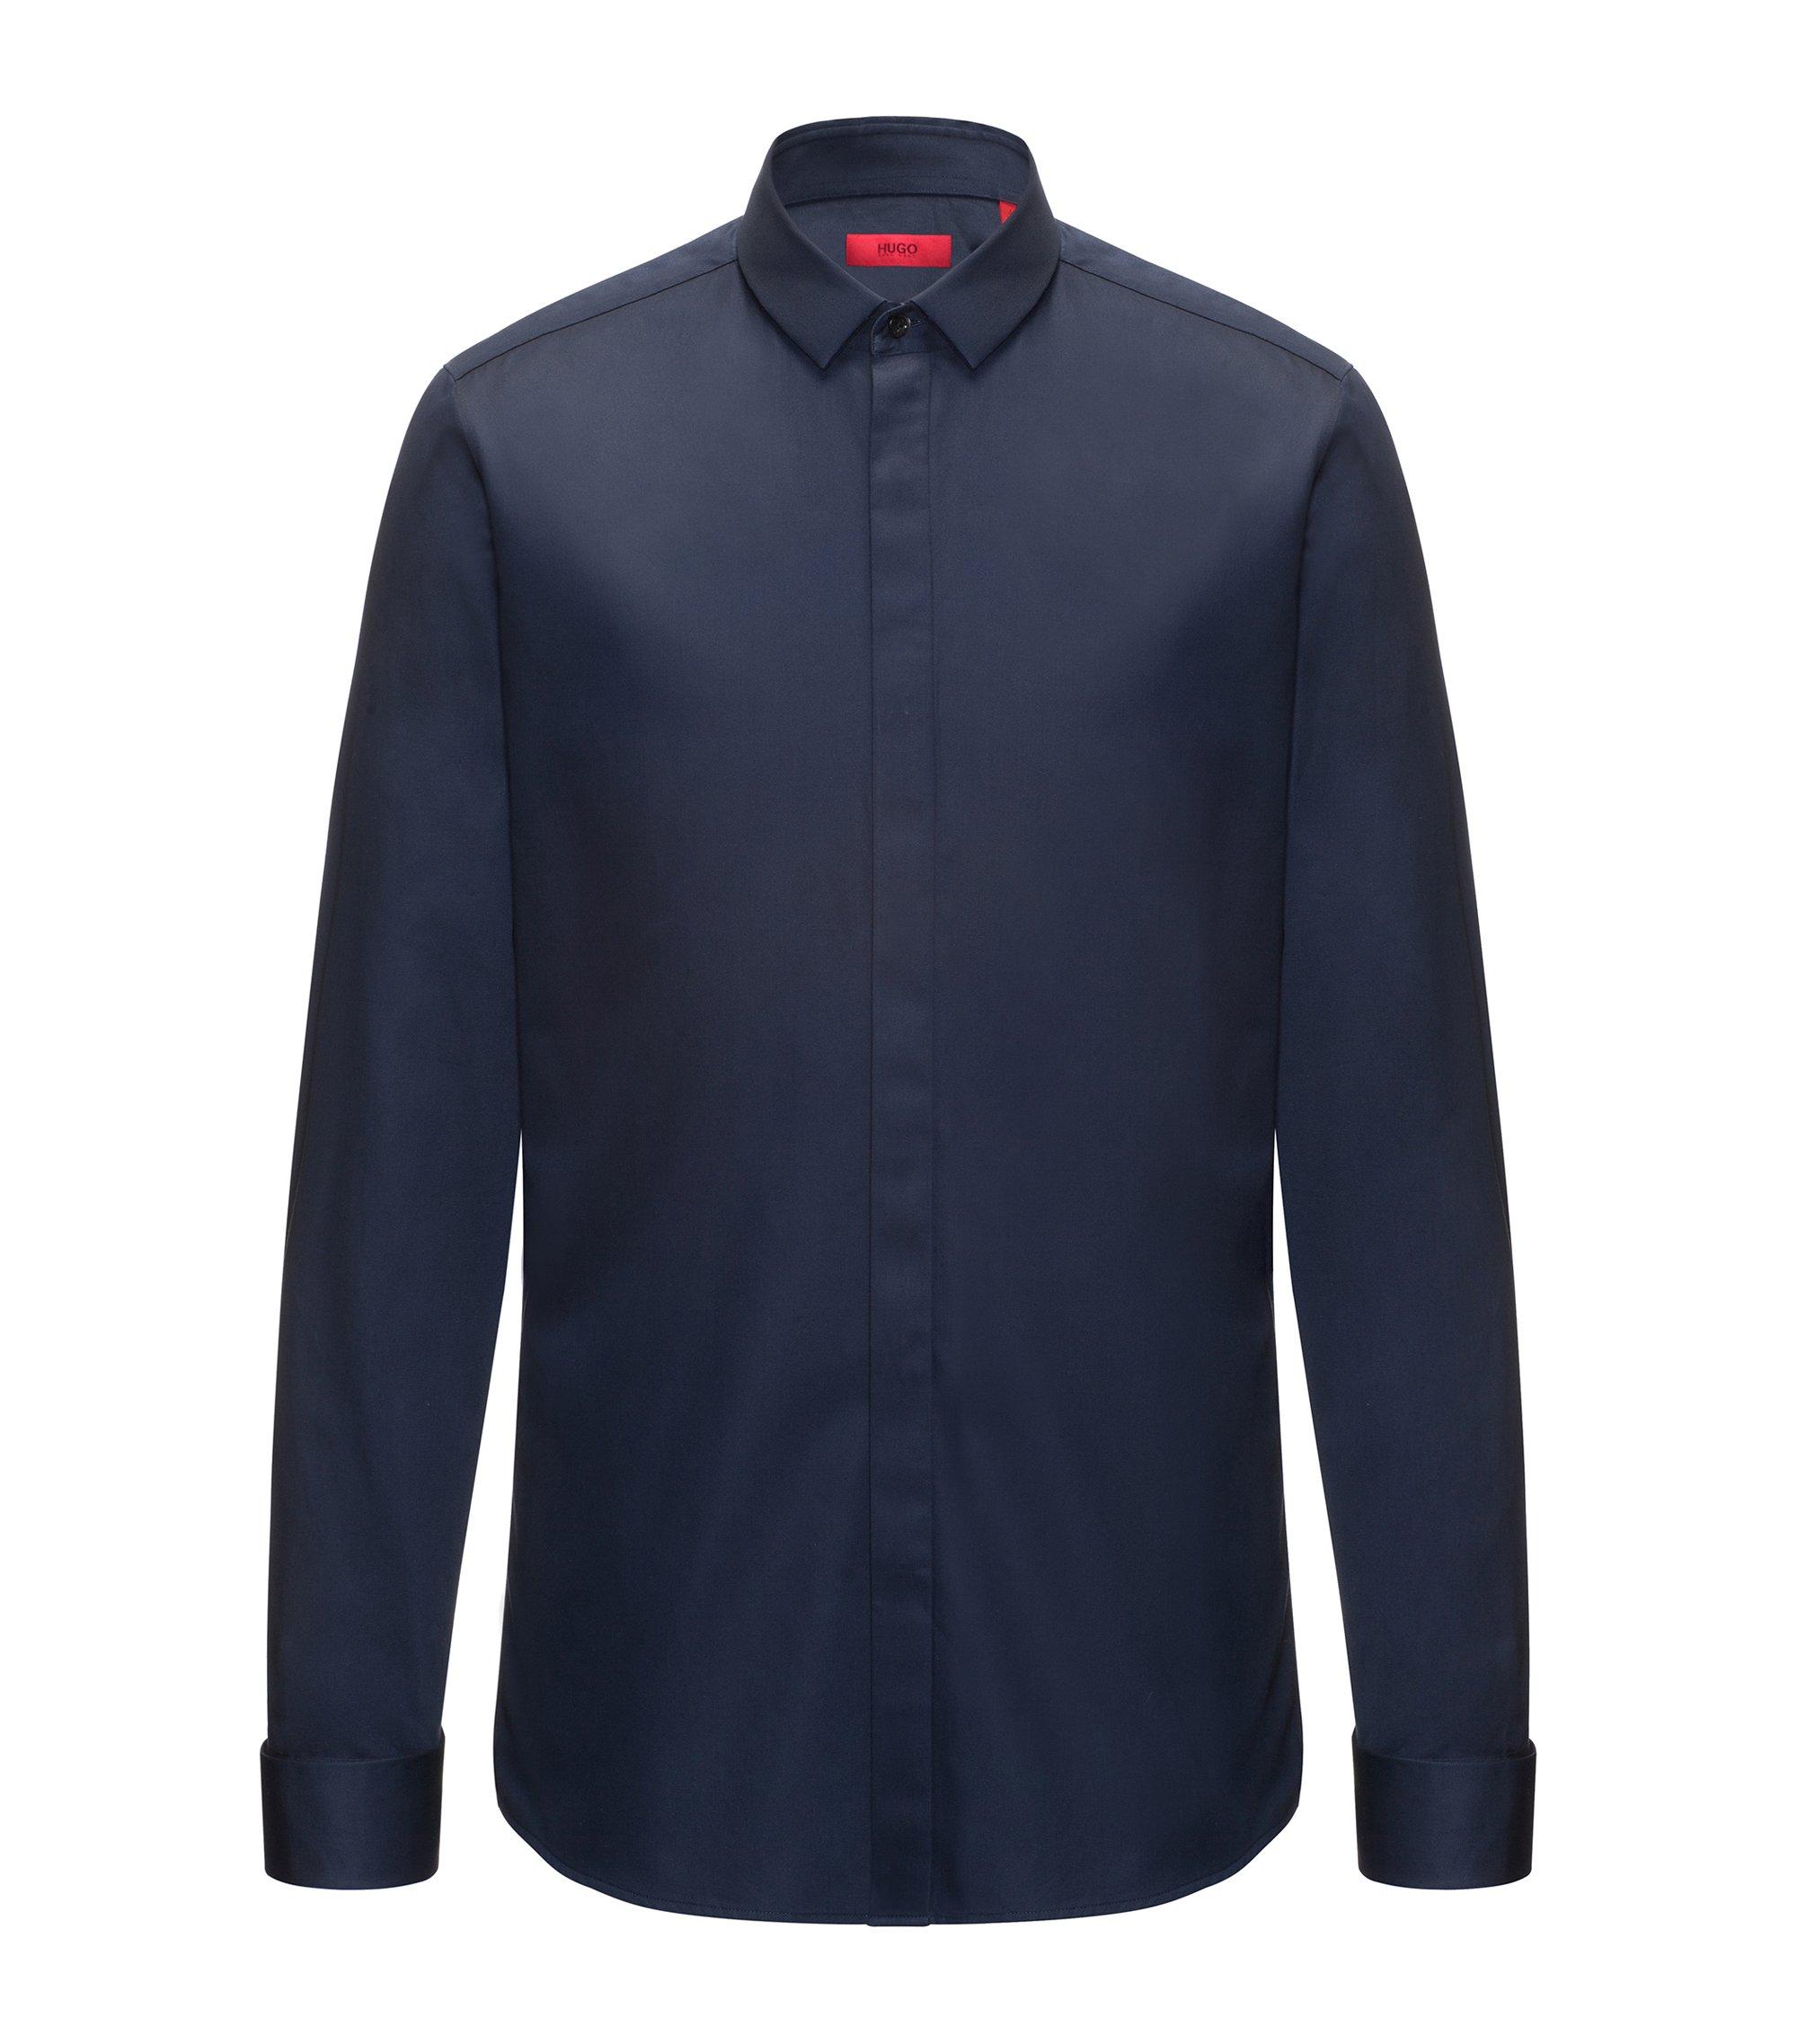 Extra Slim-Fit Hemd aus Baumwoll-Satin, Dunkelblau